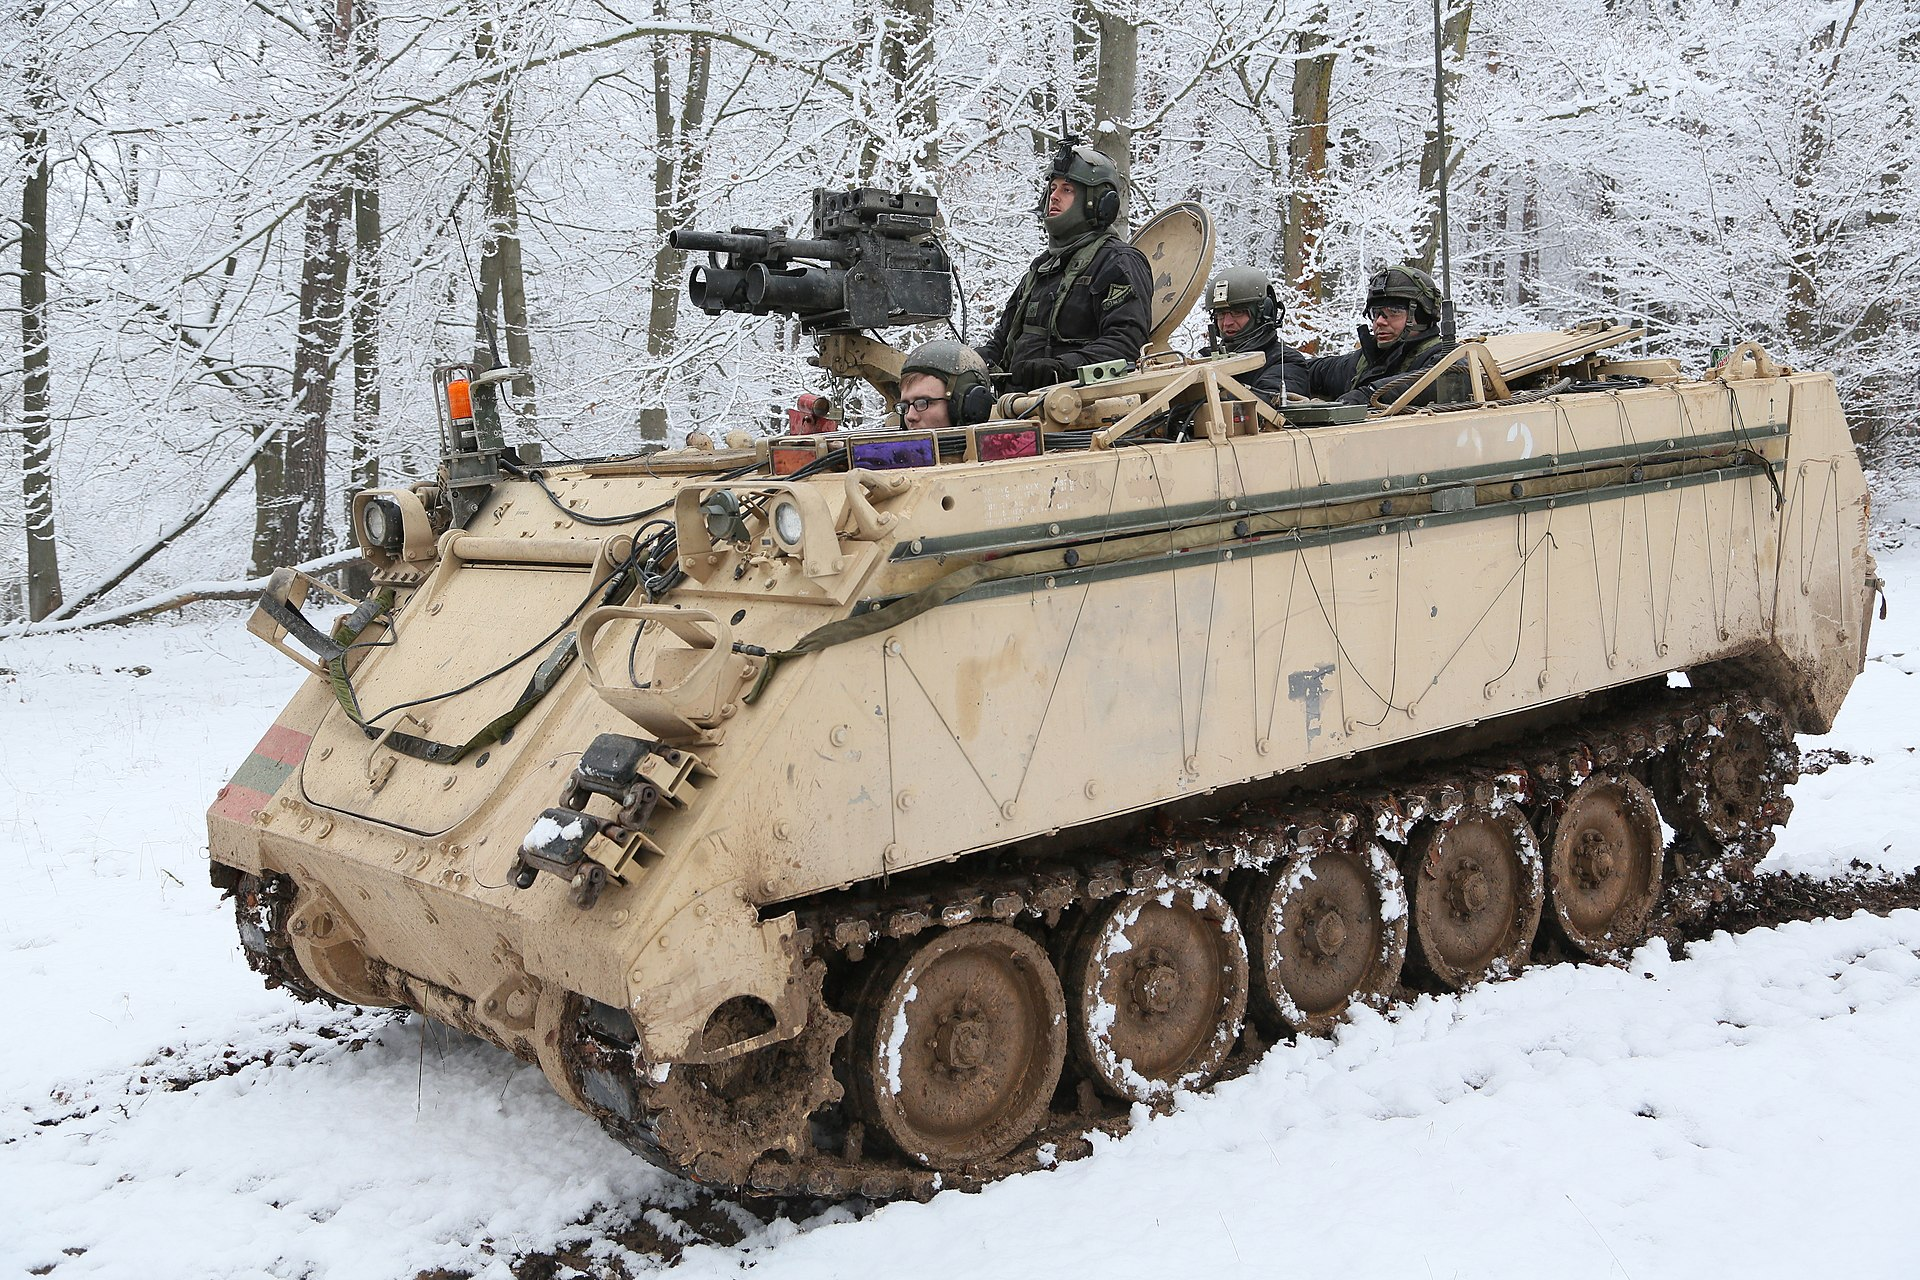 Michigan Jordan Gear >> M113 armored personnel carrier - Wikipedia